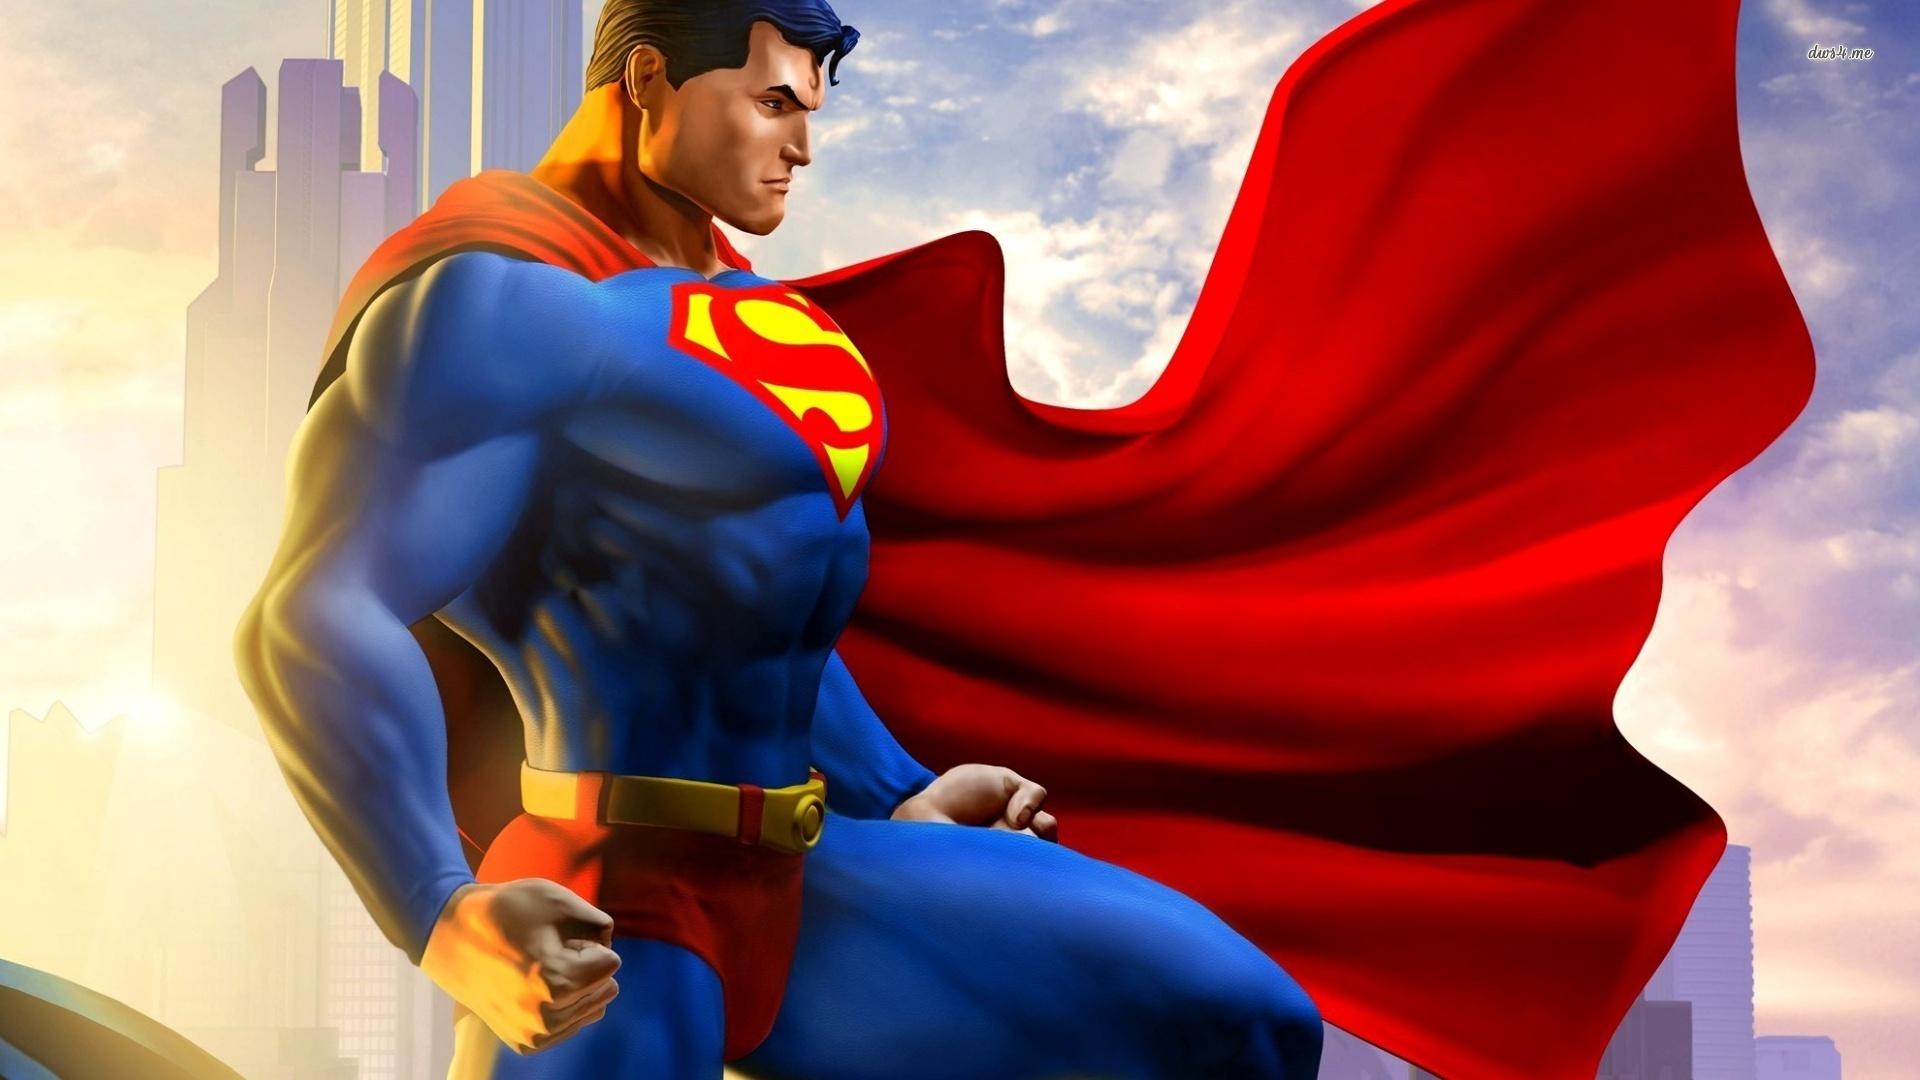 Superman HD Wallpaper for Desktop (9)